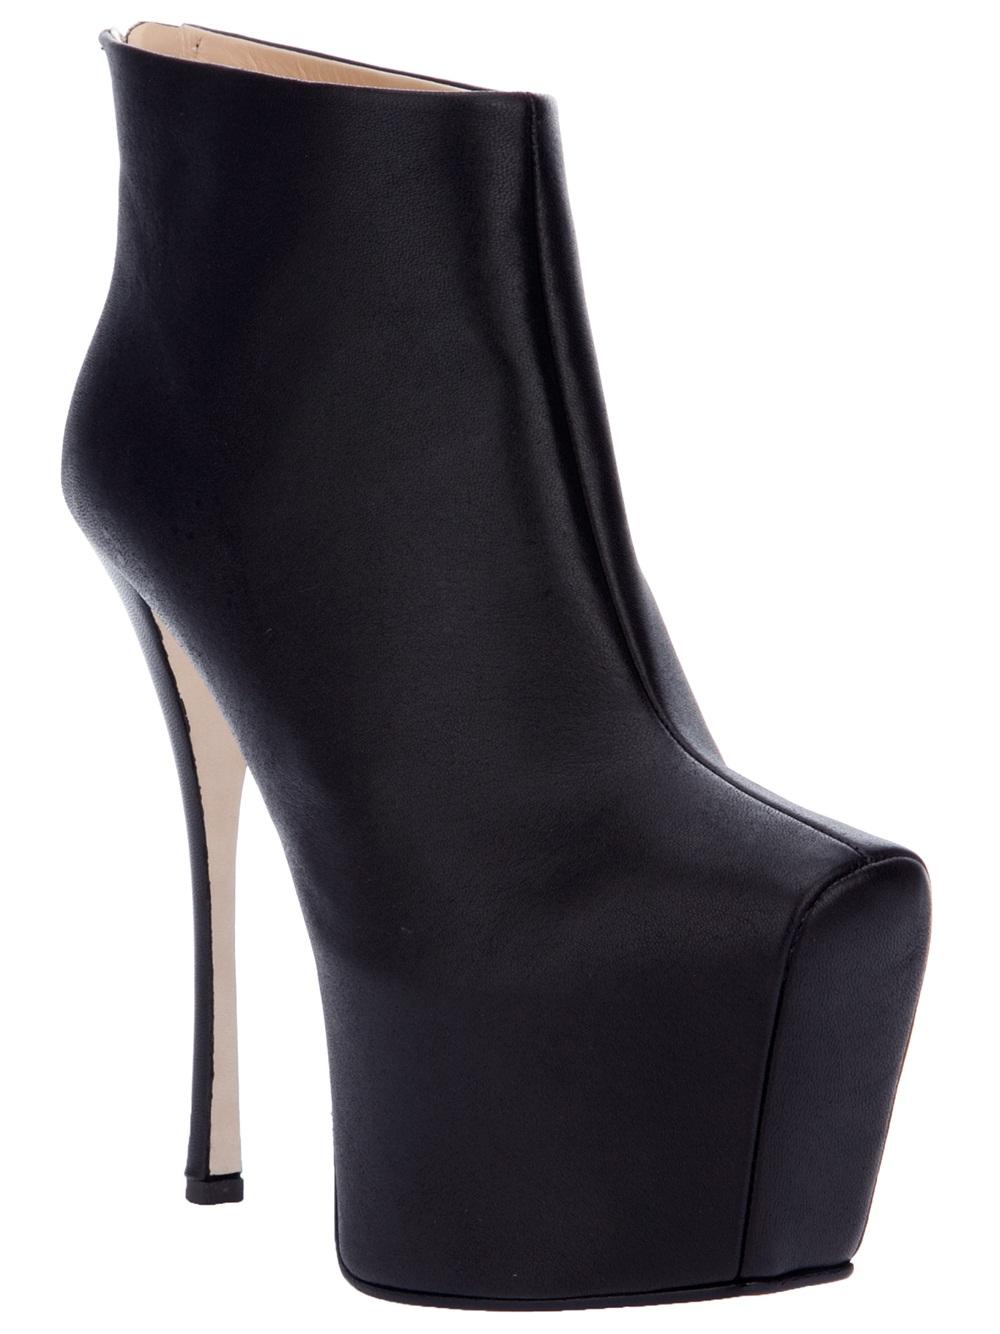 platform stiletto boots - Black Giuseppe Zanotti W9hx8dn